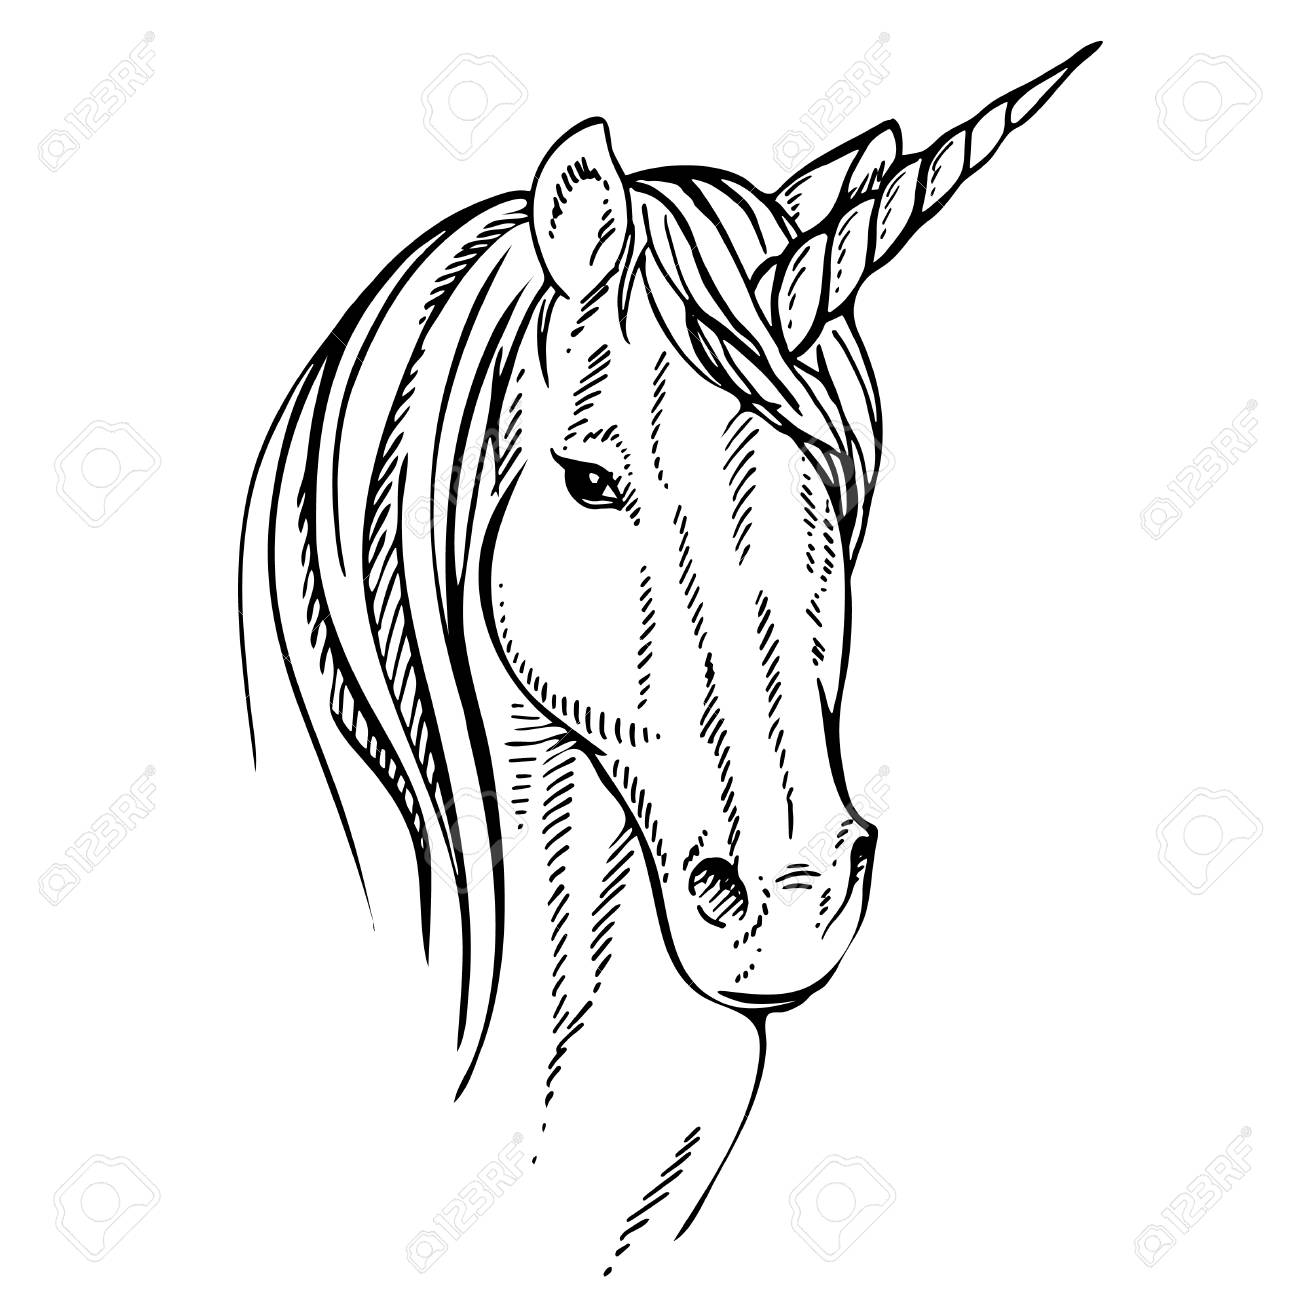 1300x1300 Sketch Unicorn, Hand Drawn Ink Illustration.unicorn Horse Animal